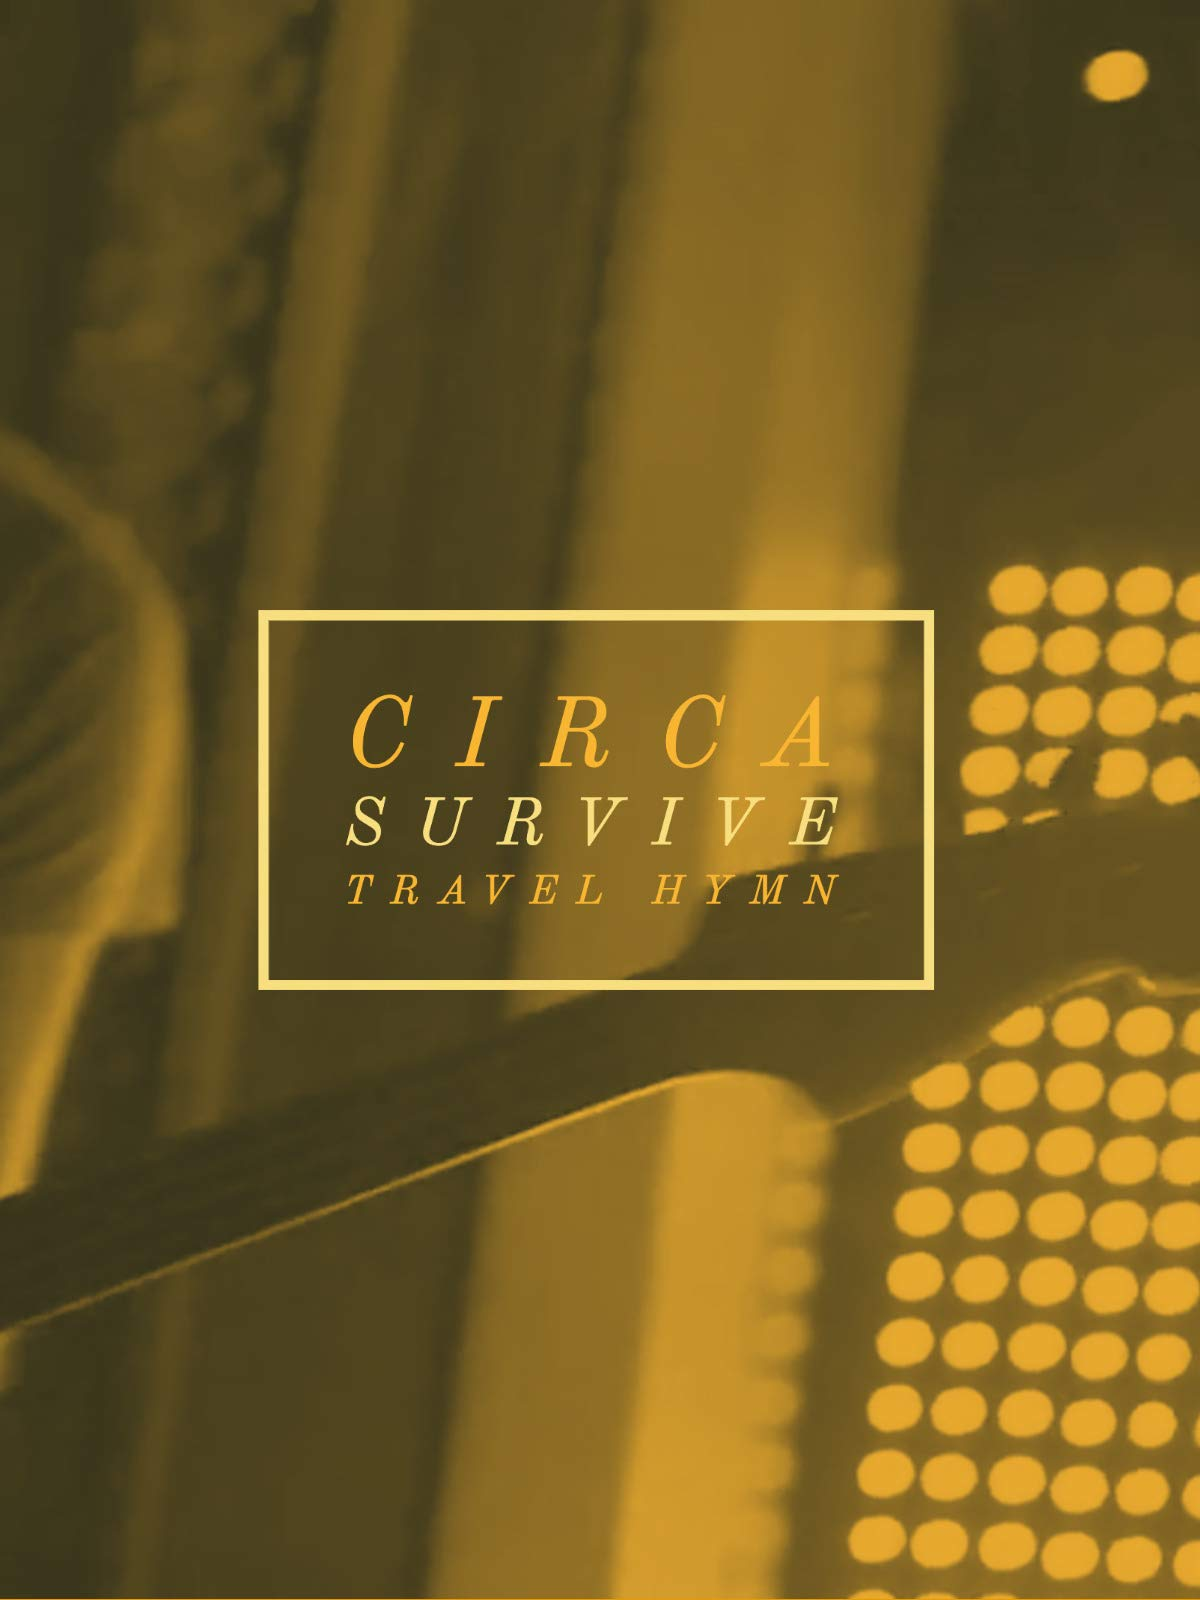 Circa Survive : Travel Hymn on Amazon Prime Video UK